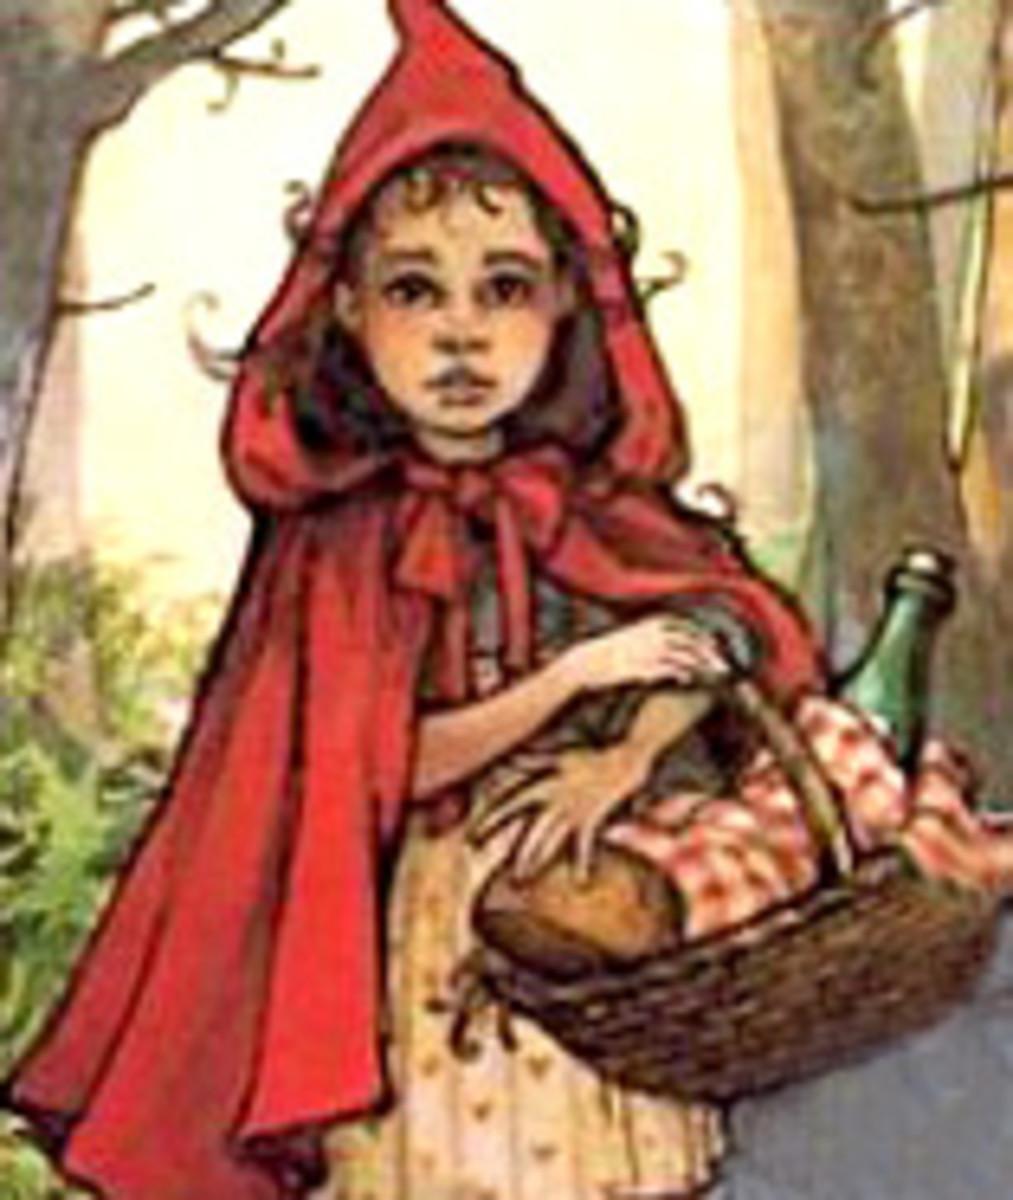 Red Riding Hood bringing Grandma basket of snacks and bottle of wine